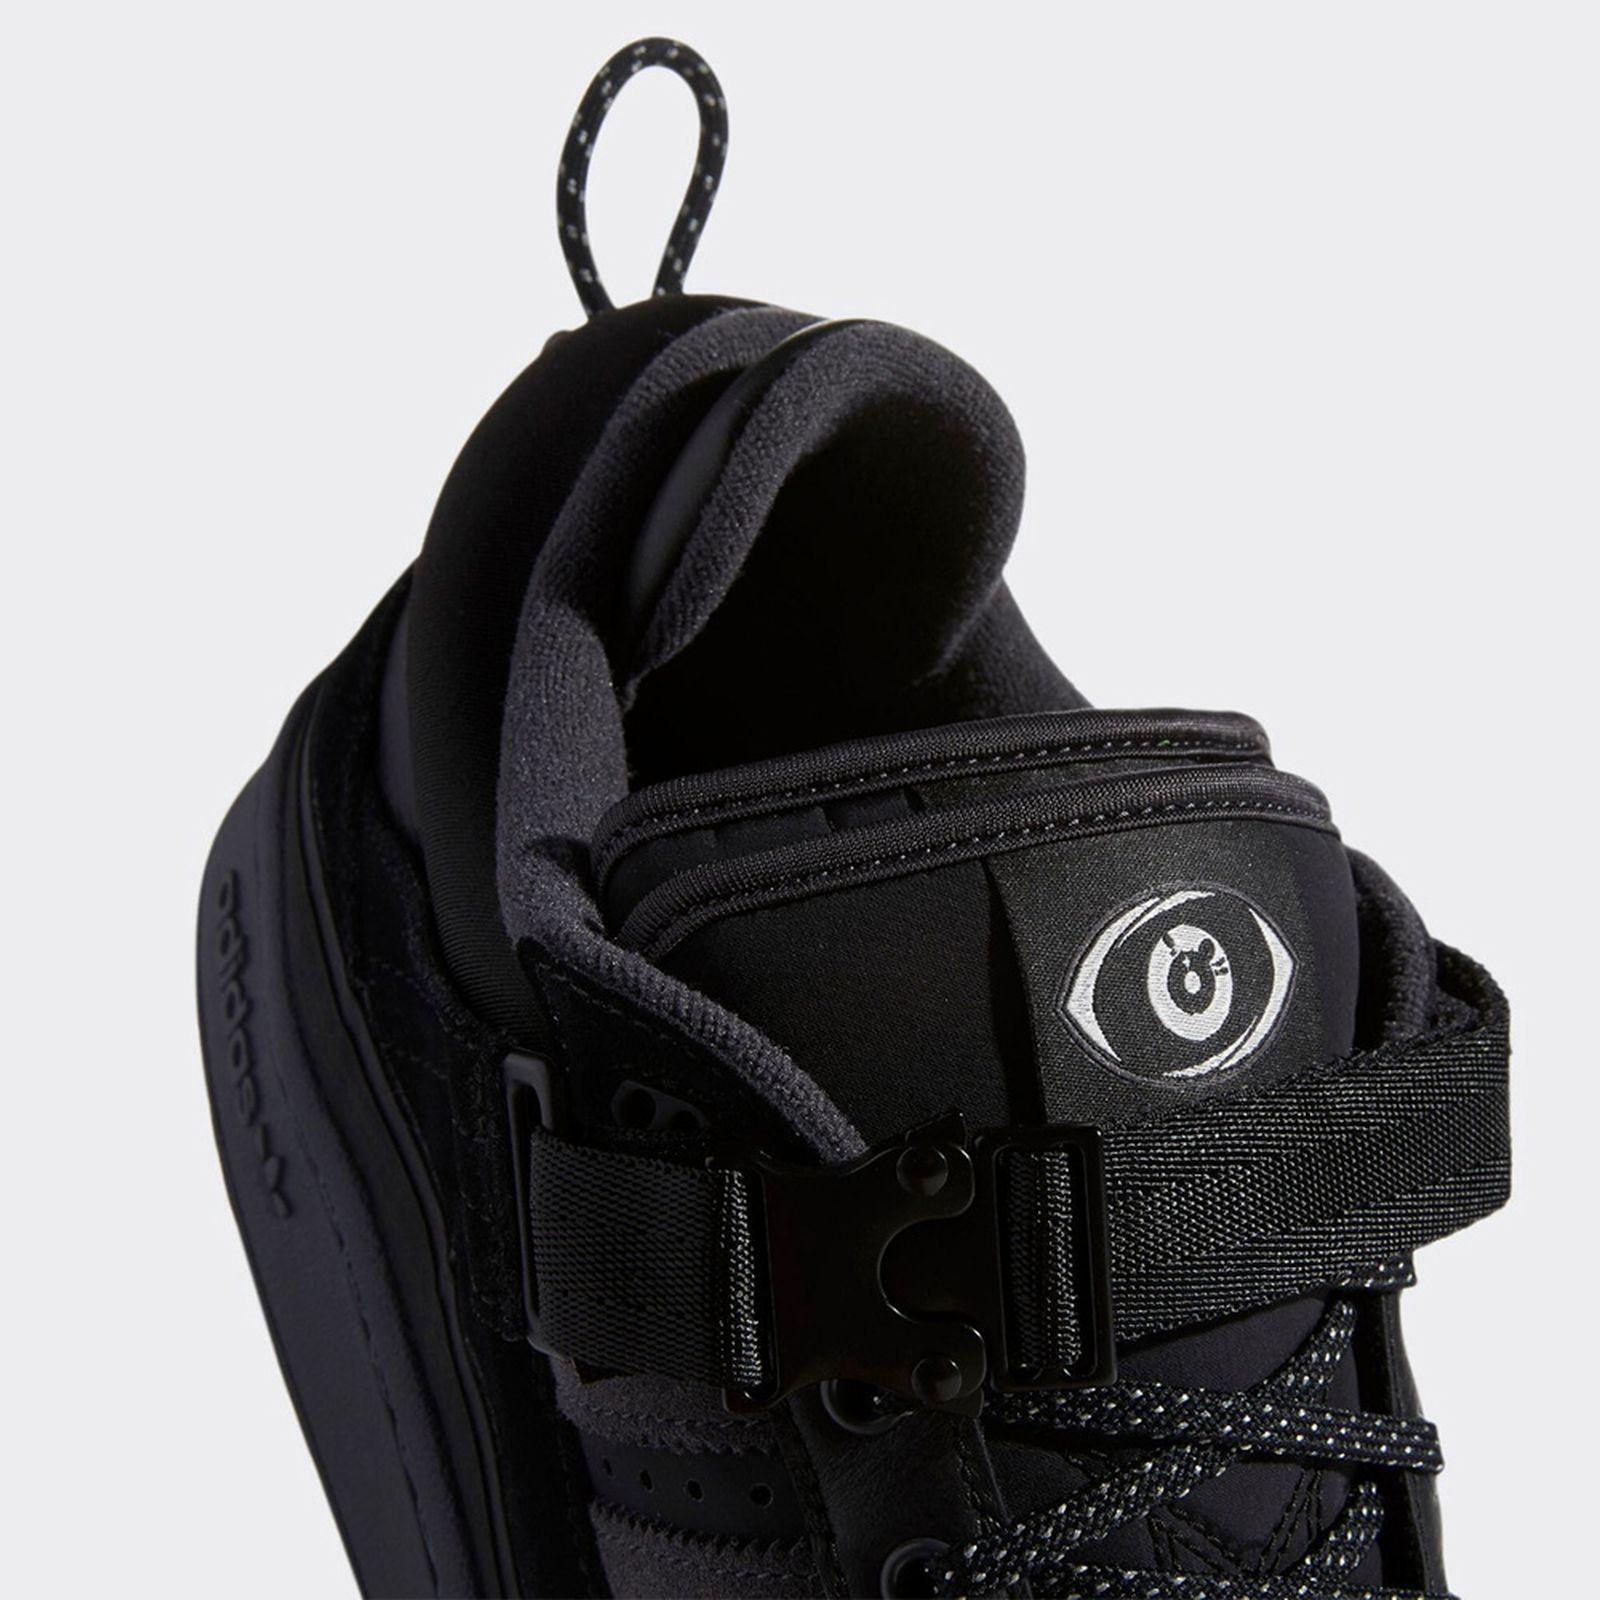 bad-bunny-adidas-originals-forum-low-triple-black-release-date-price-09